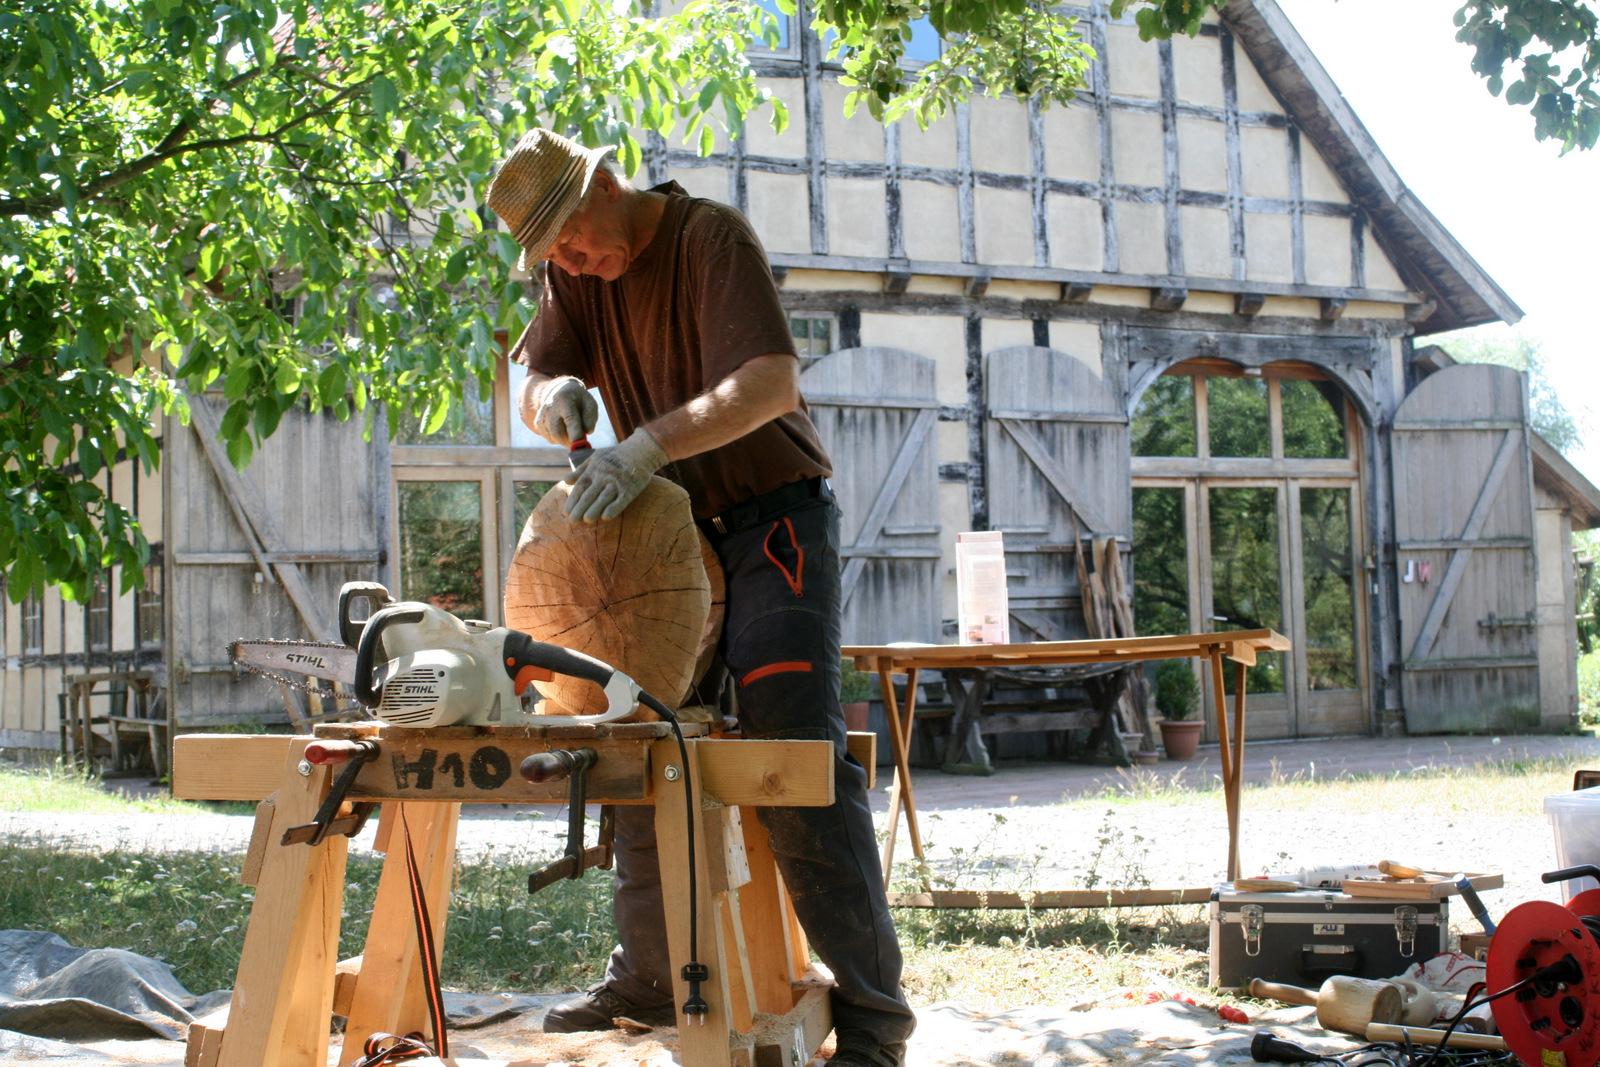 Atelier hestia im Kloster Malgarten: Holzsymposium, Helmut Szepansky